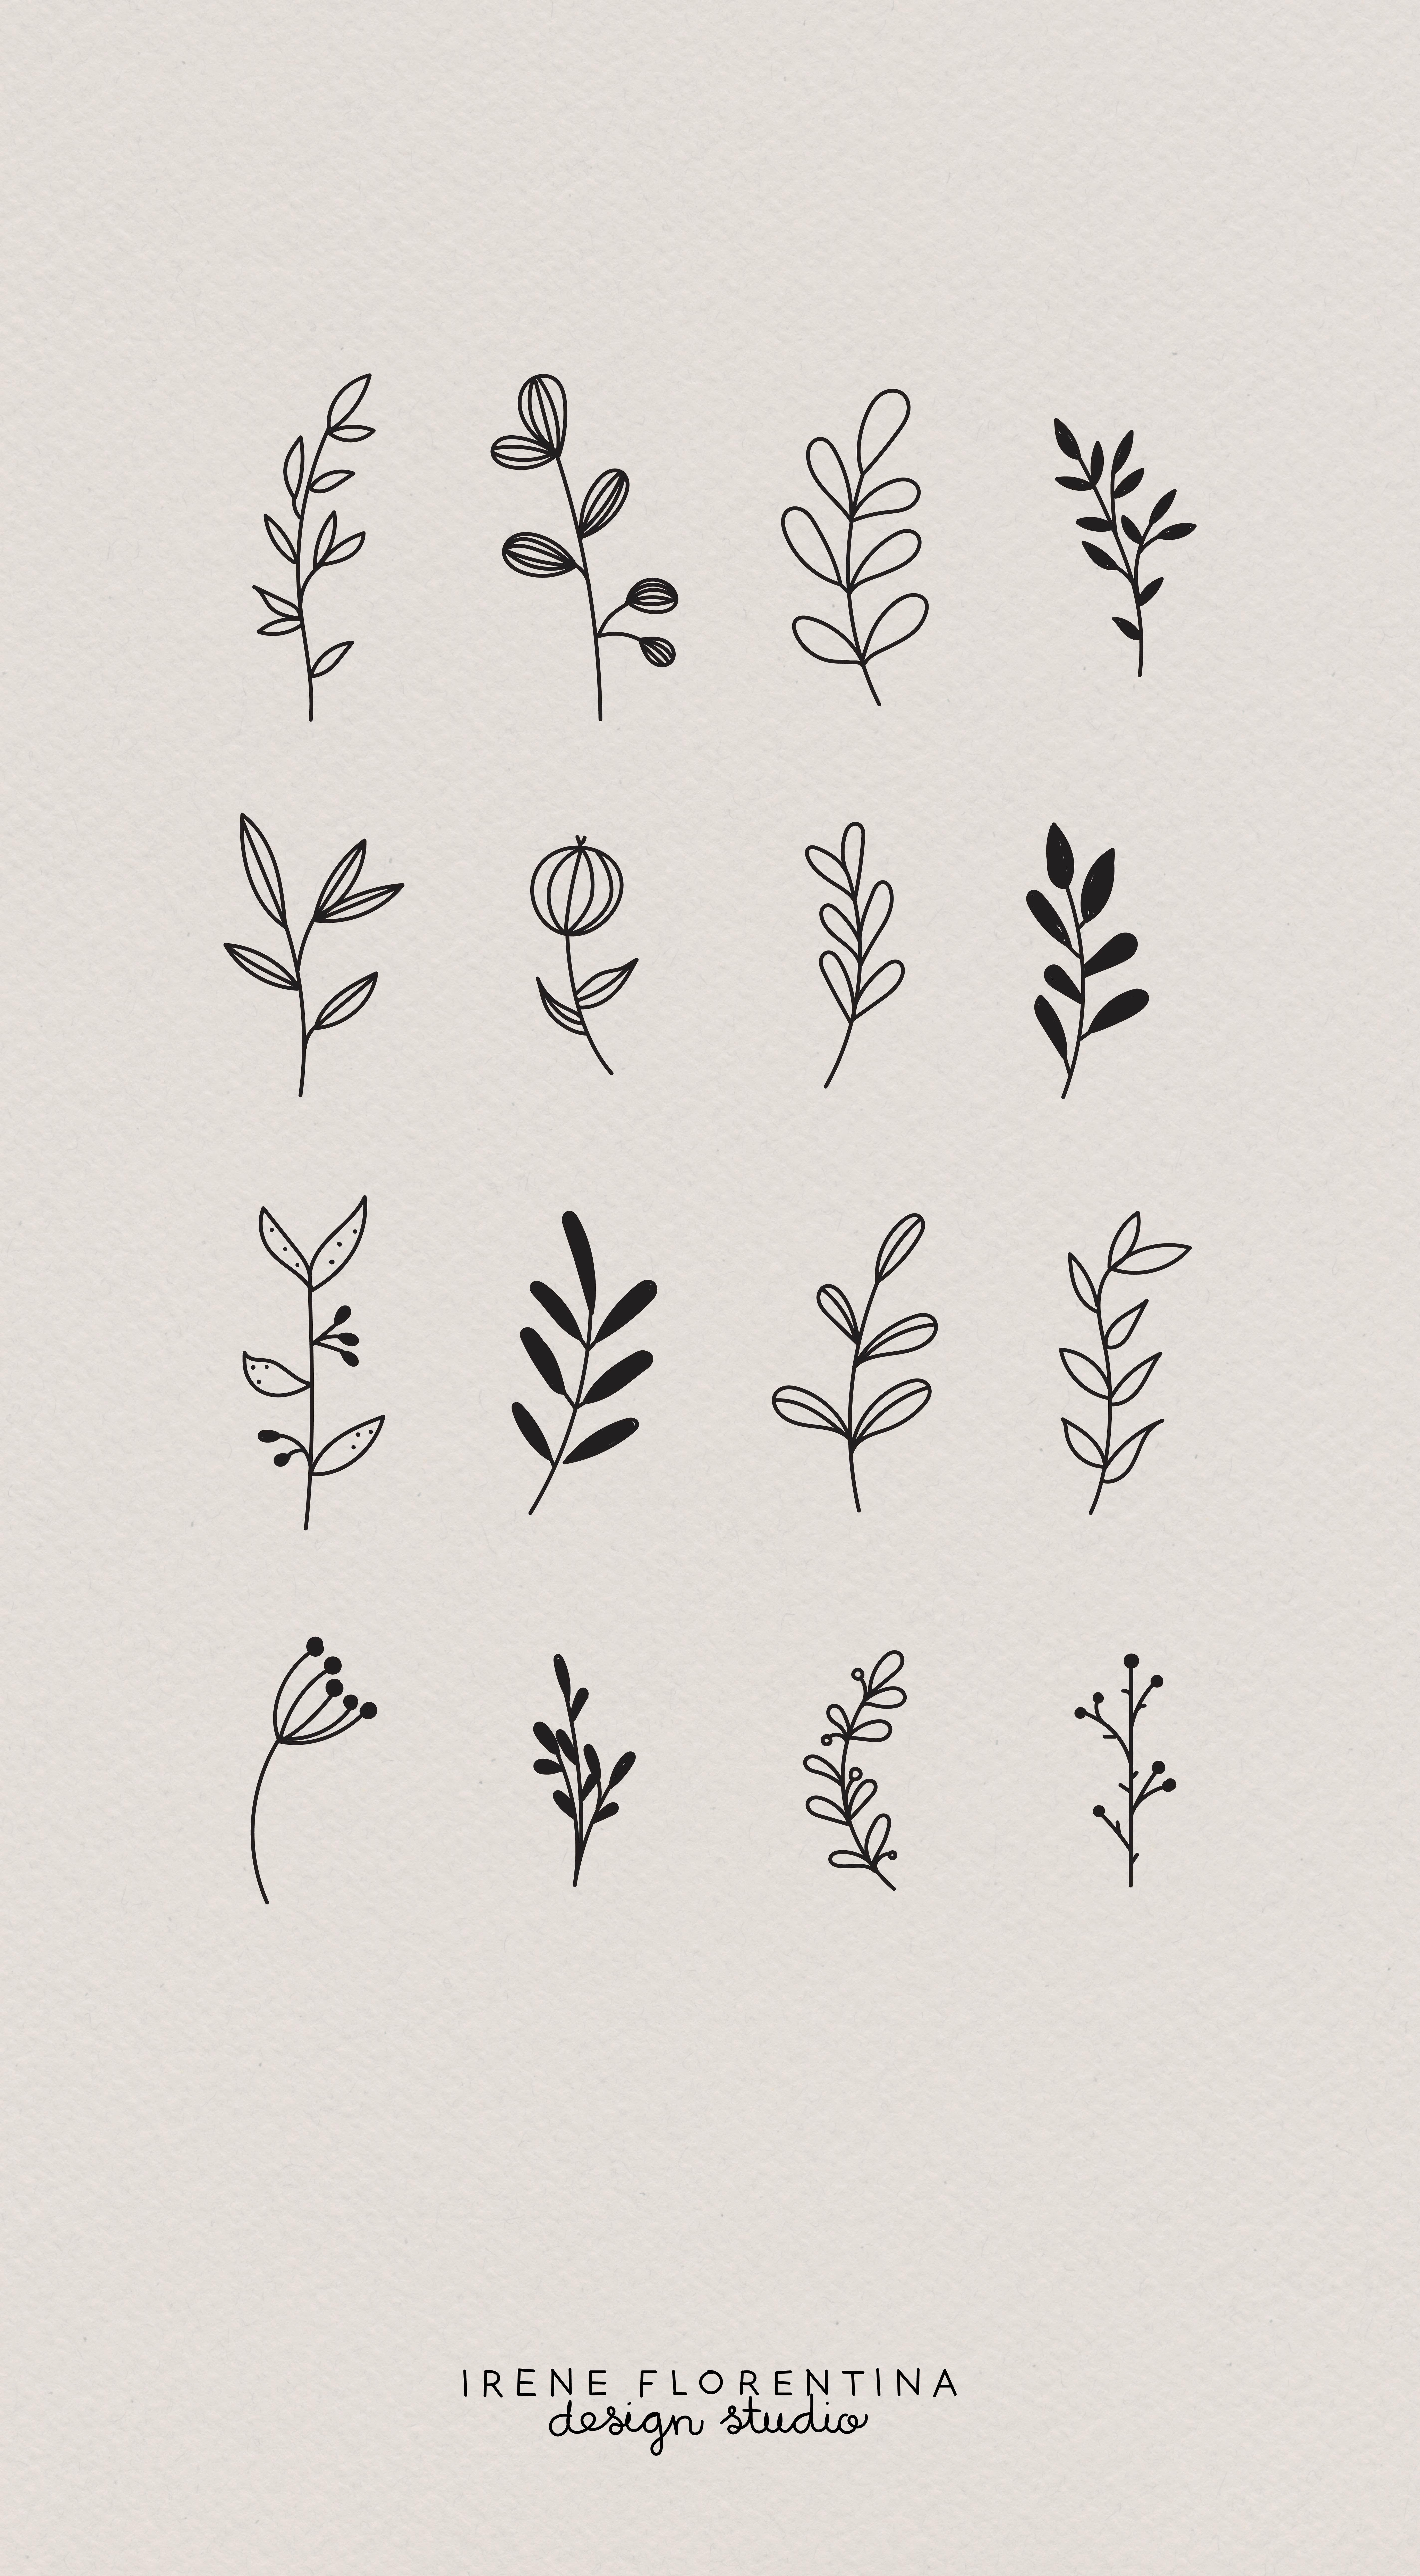 50 Botanical Illustrations Hand Drawn